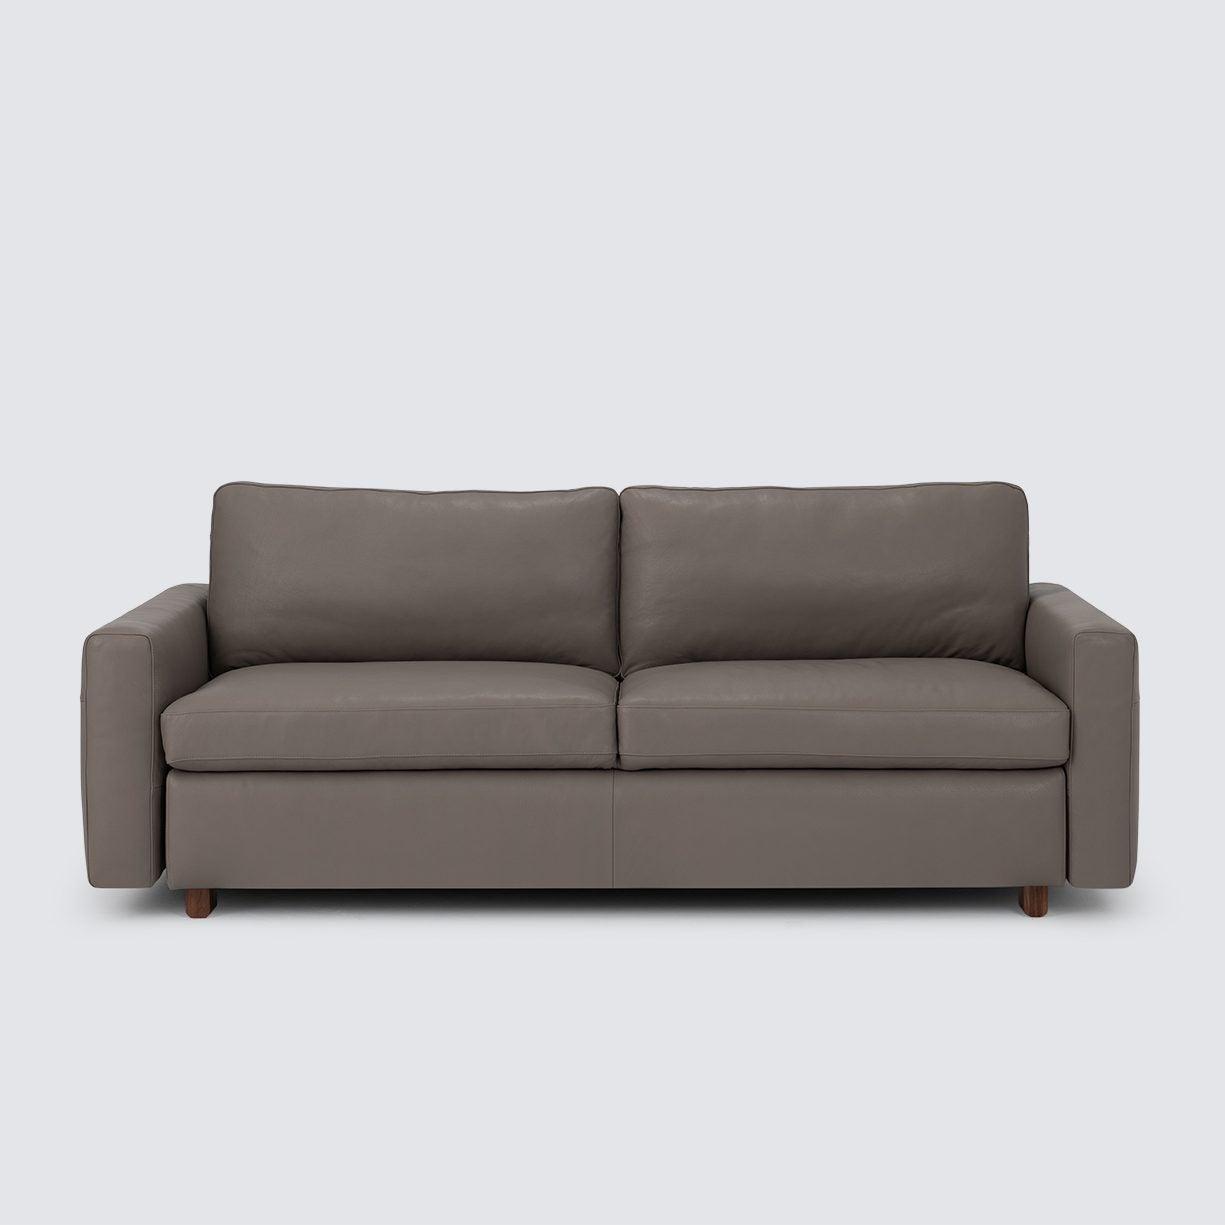 Reva Storage Sofa 2